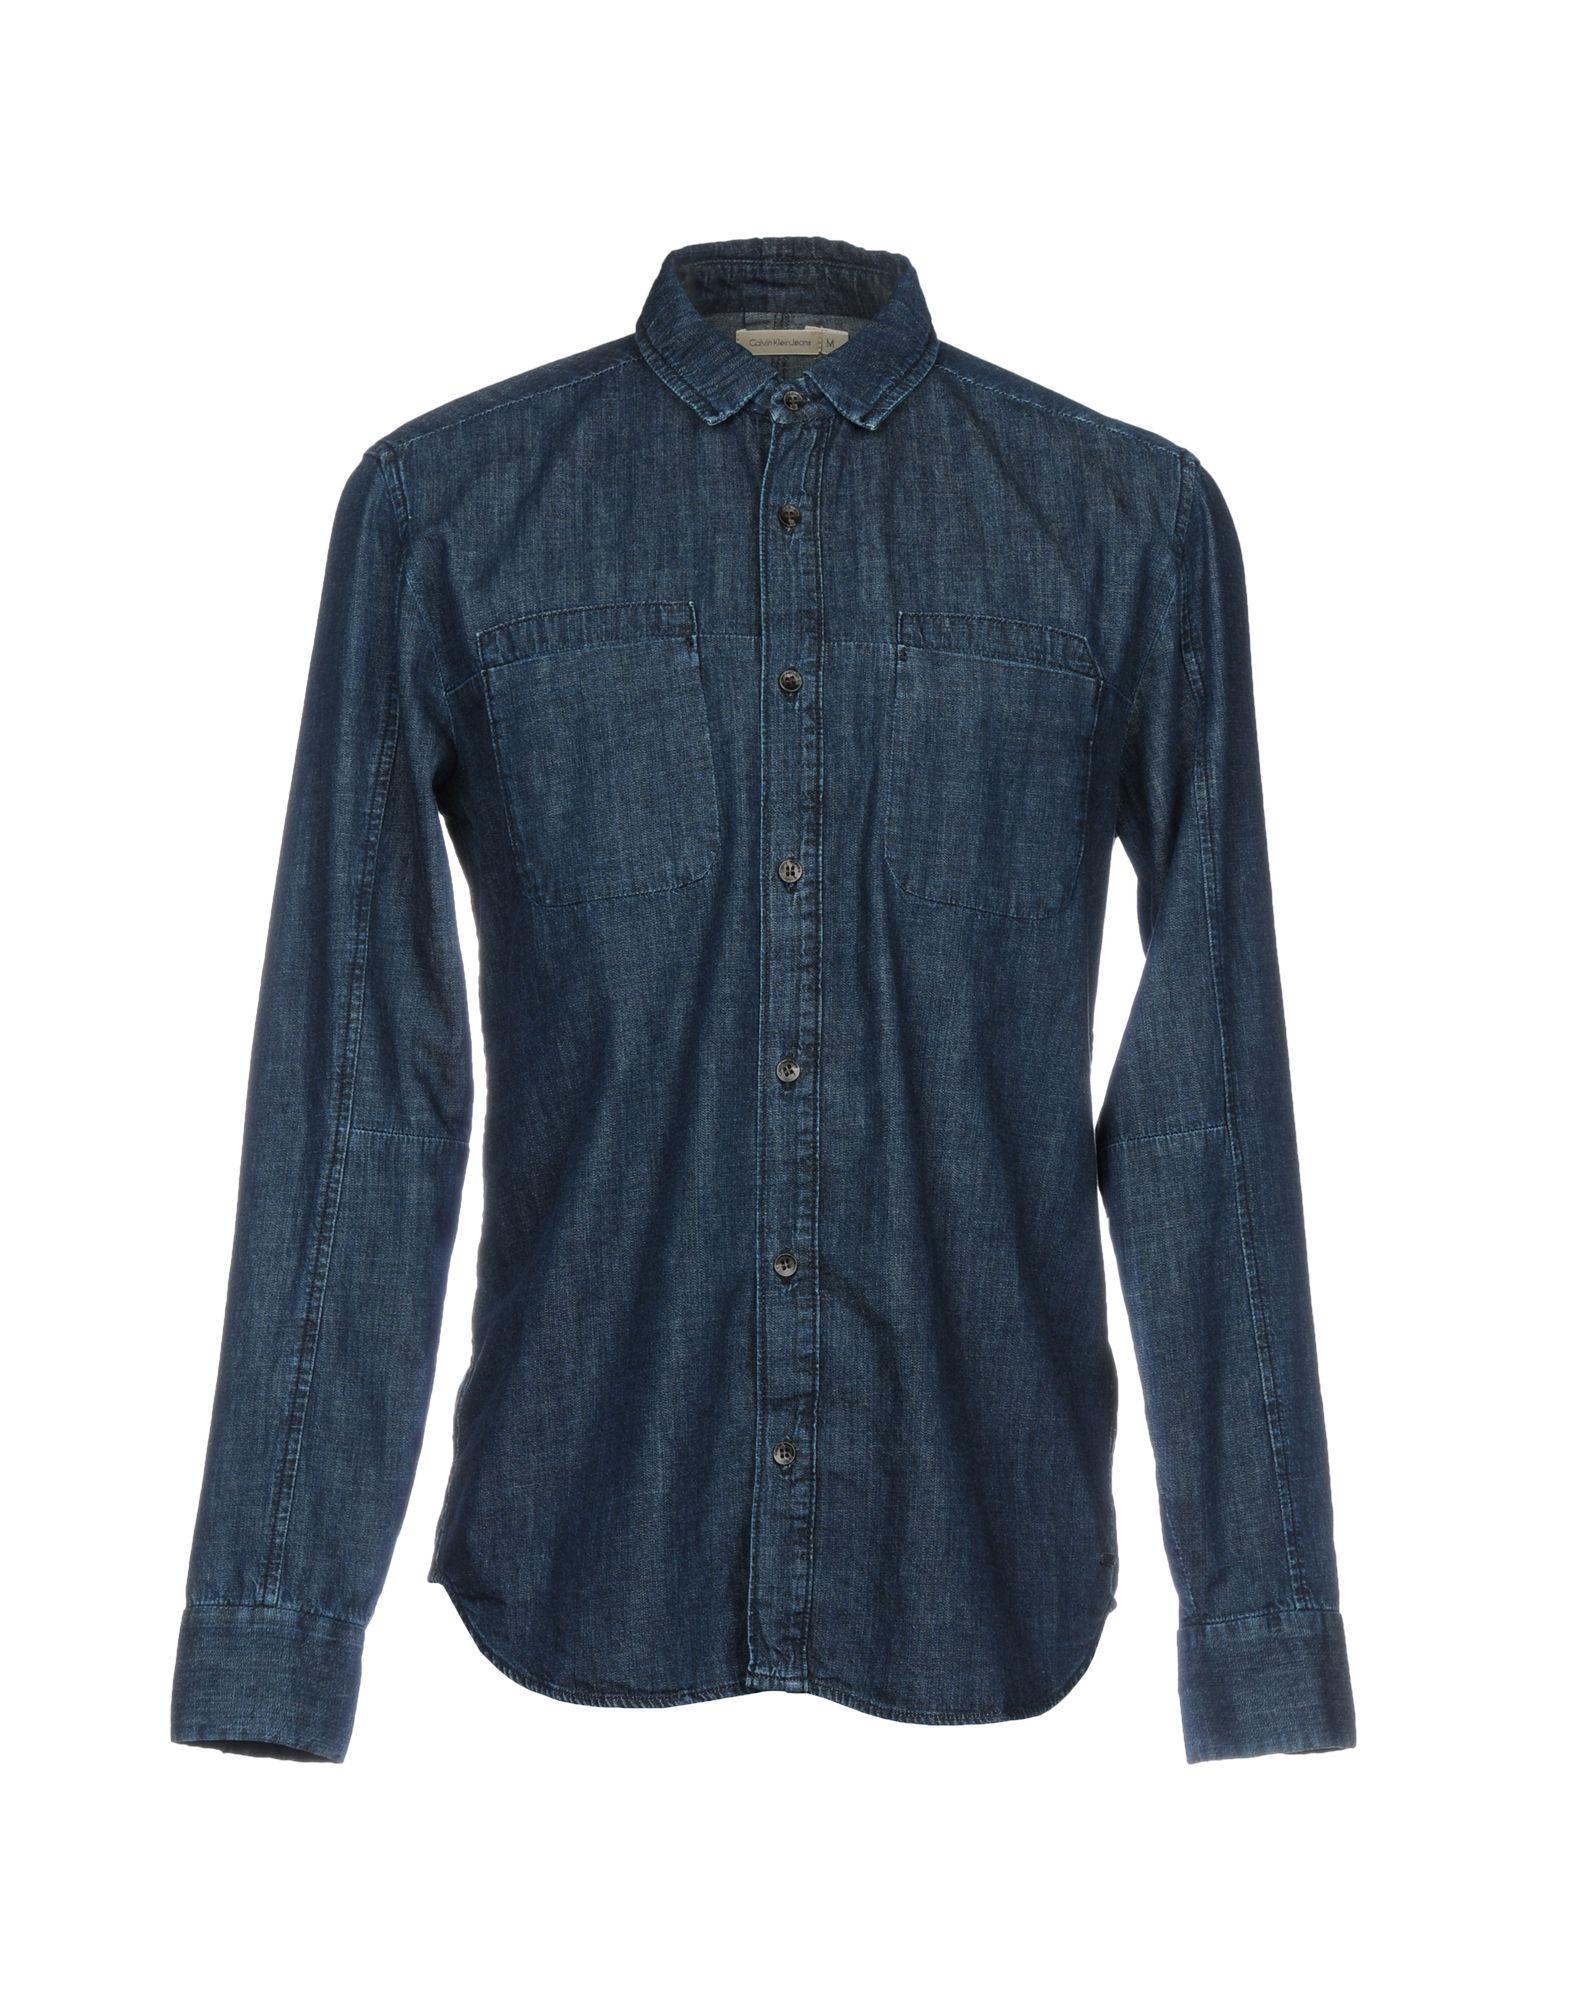 CALVIN KLEIN JEANS Джинсовая рубашка hengfang 52135 princess style water resistant eyeliner gel w brush black